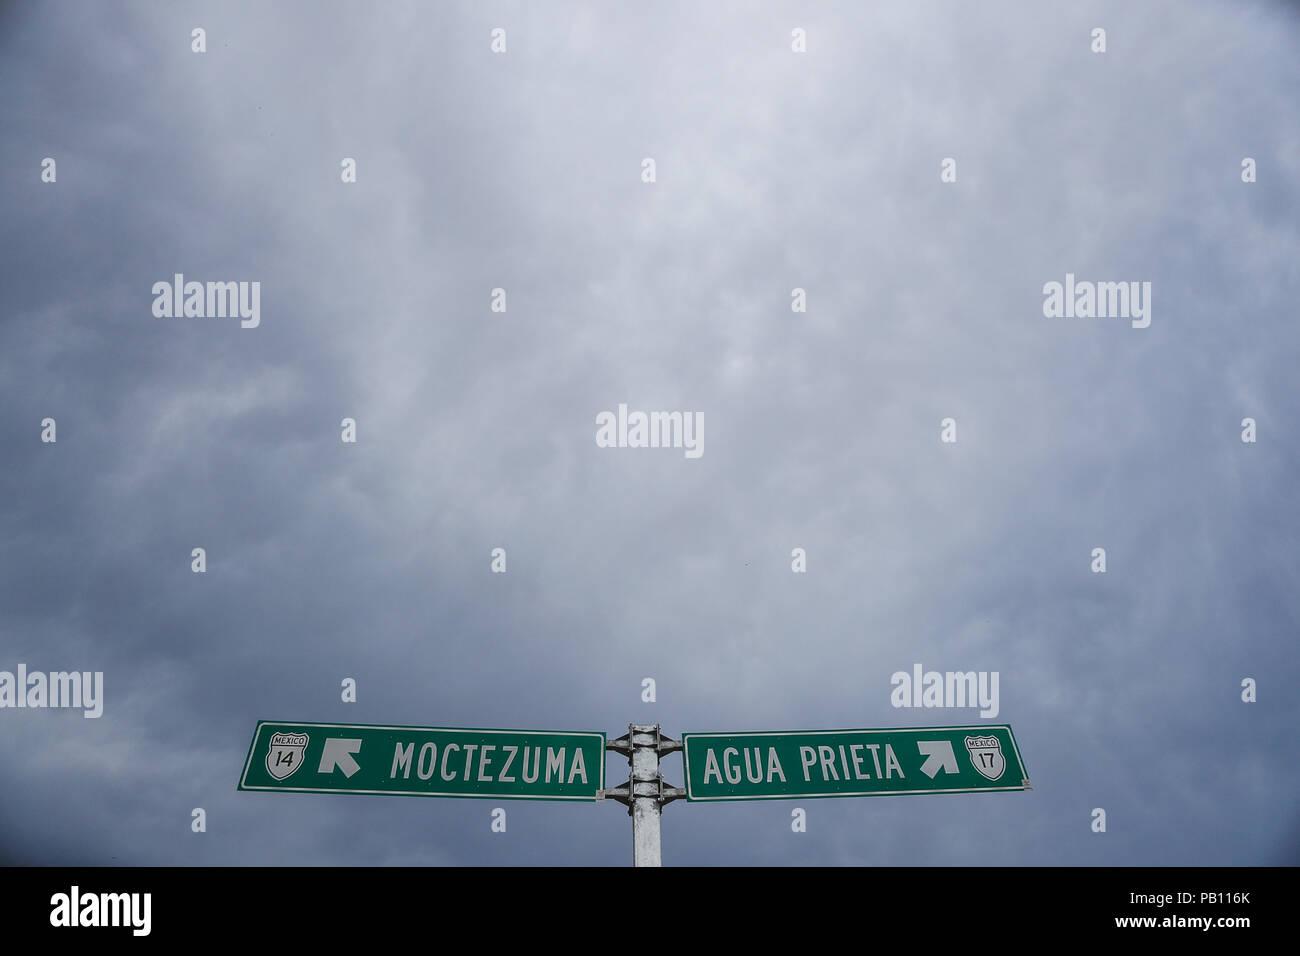 Señalizacion en carretera. Ruta a Agua Prieta y Ruta a Moctezuma en la carretera la intersección en Nacozari. - Stock Image